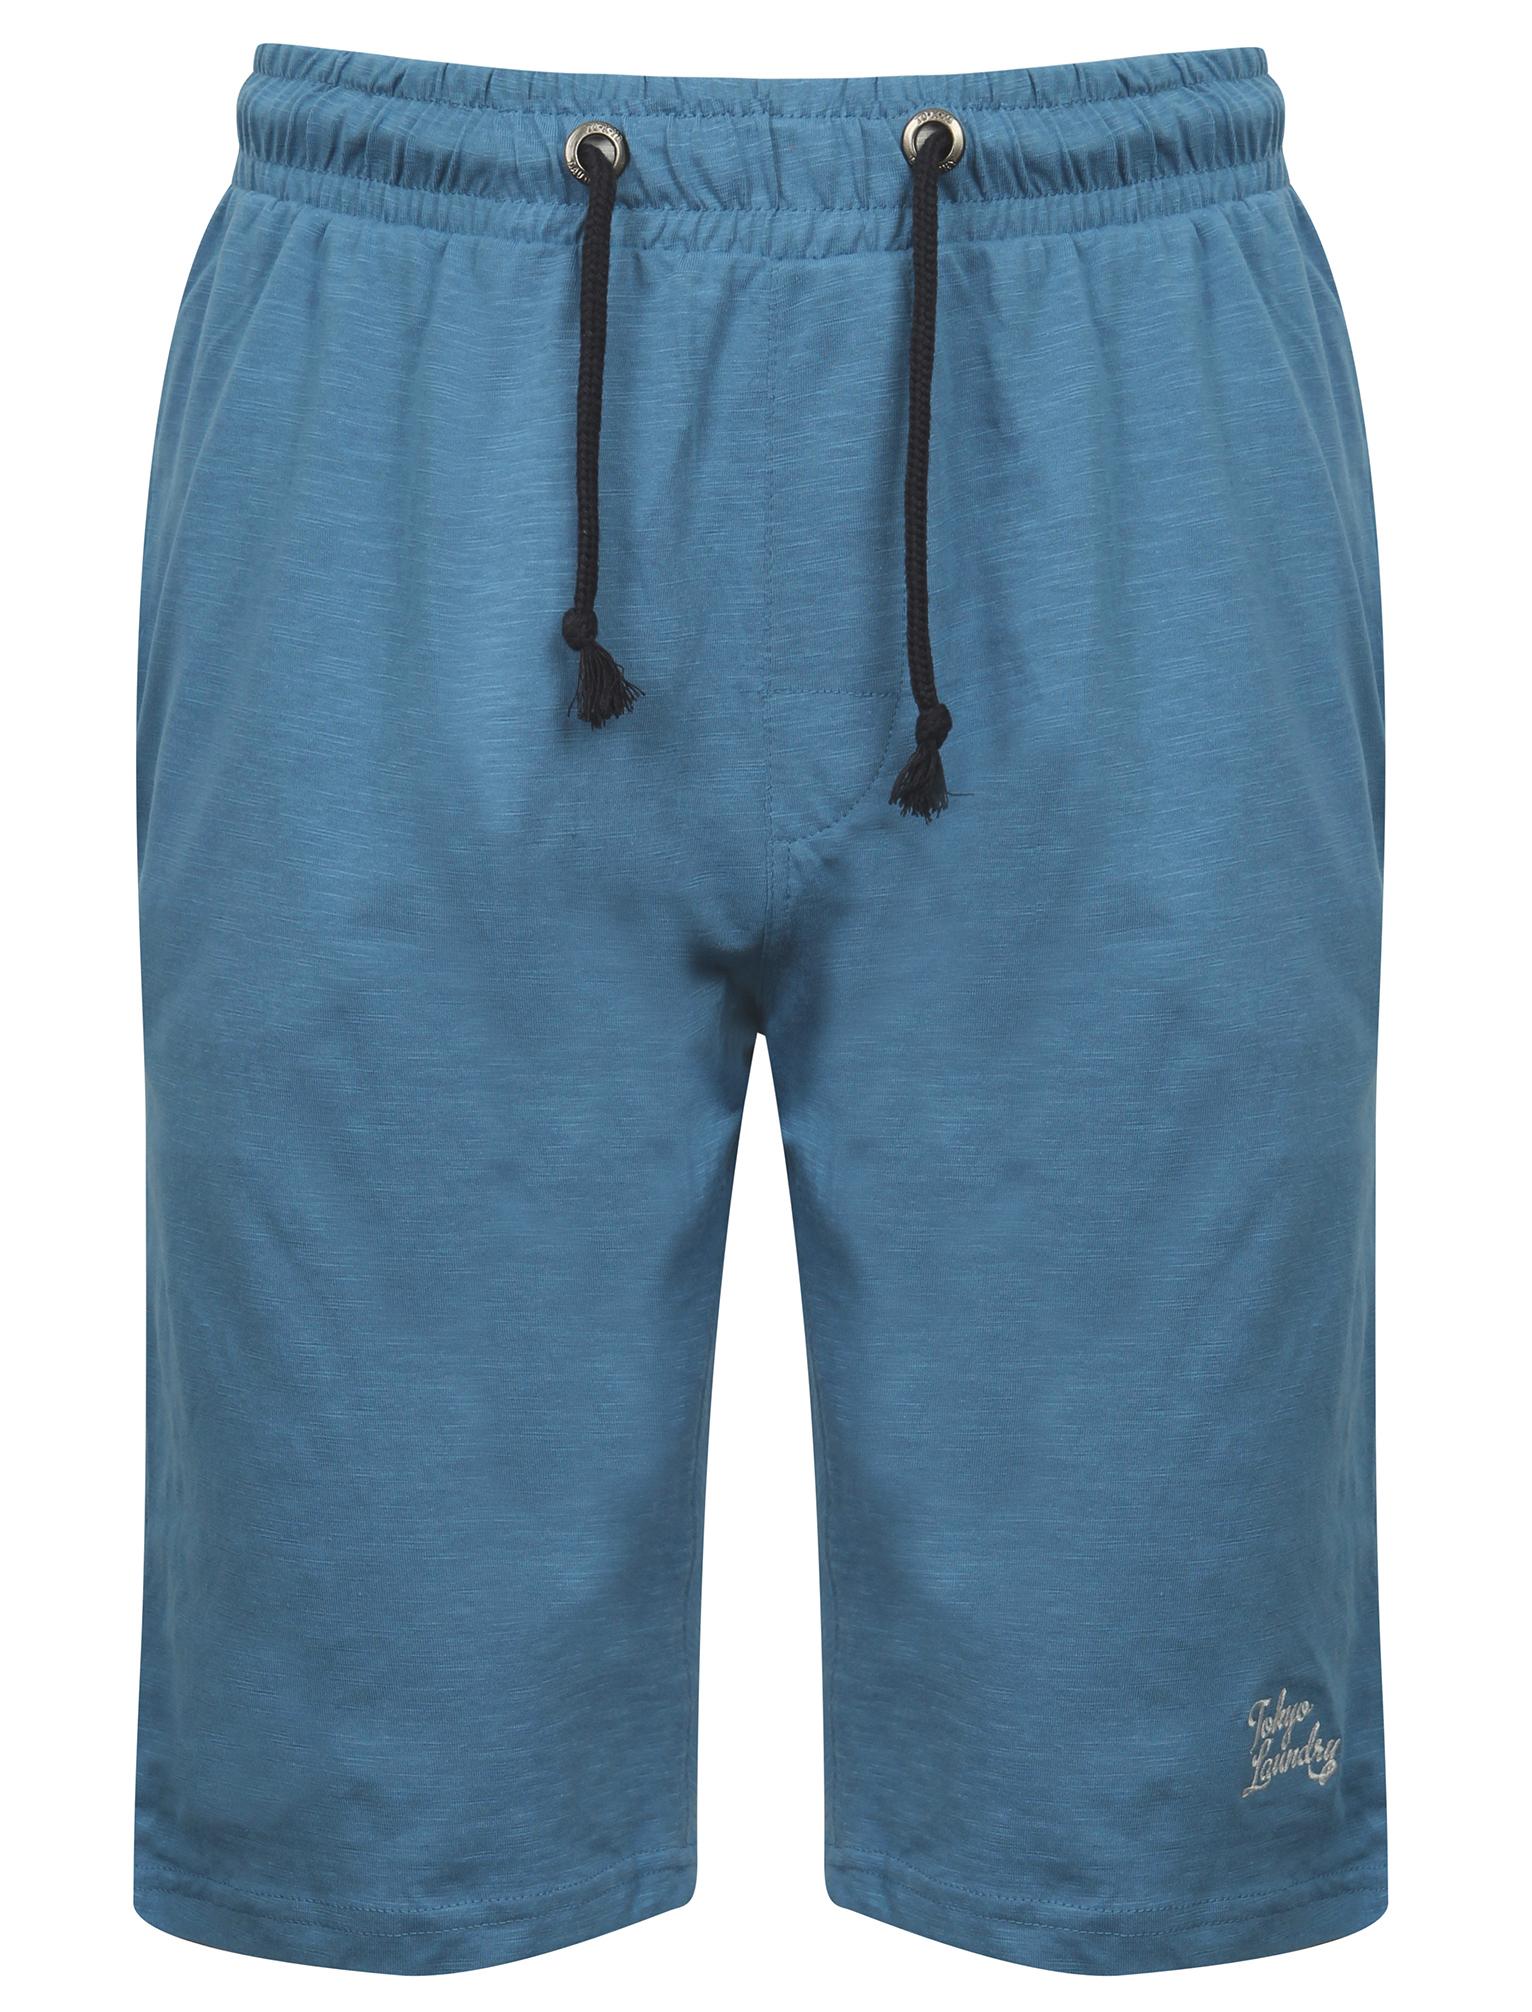 Tokyo-Laundry-Men-039-s-Gough-Cotton-Short-Sleeve-Pyjamas-PJ-Shorts-Lounge-Wear-Set thumbnail 10